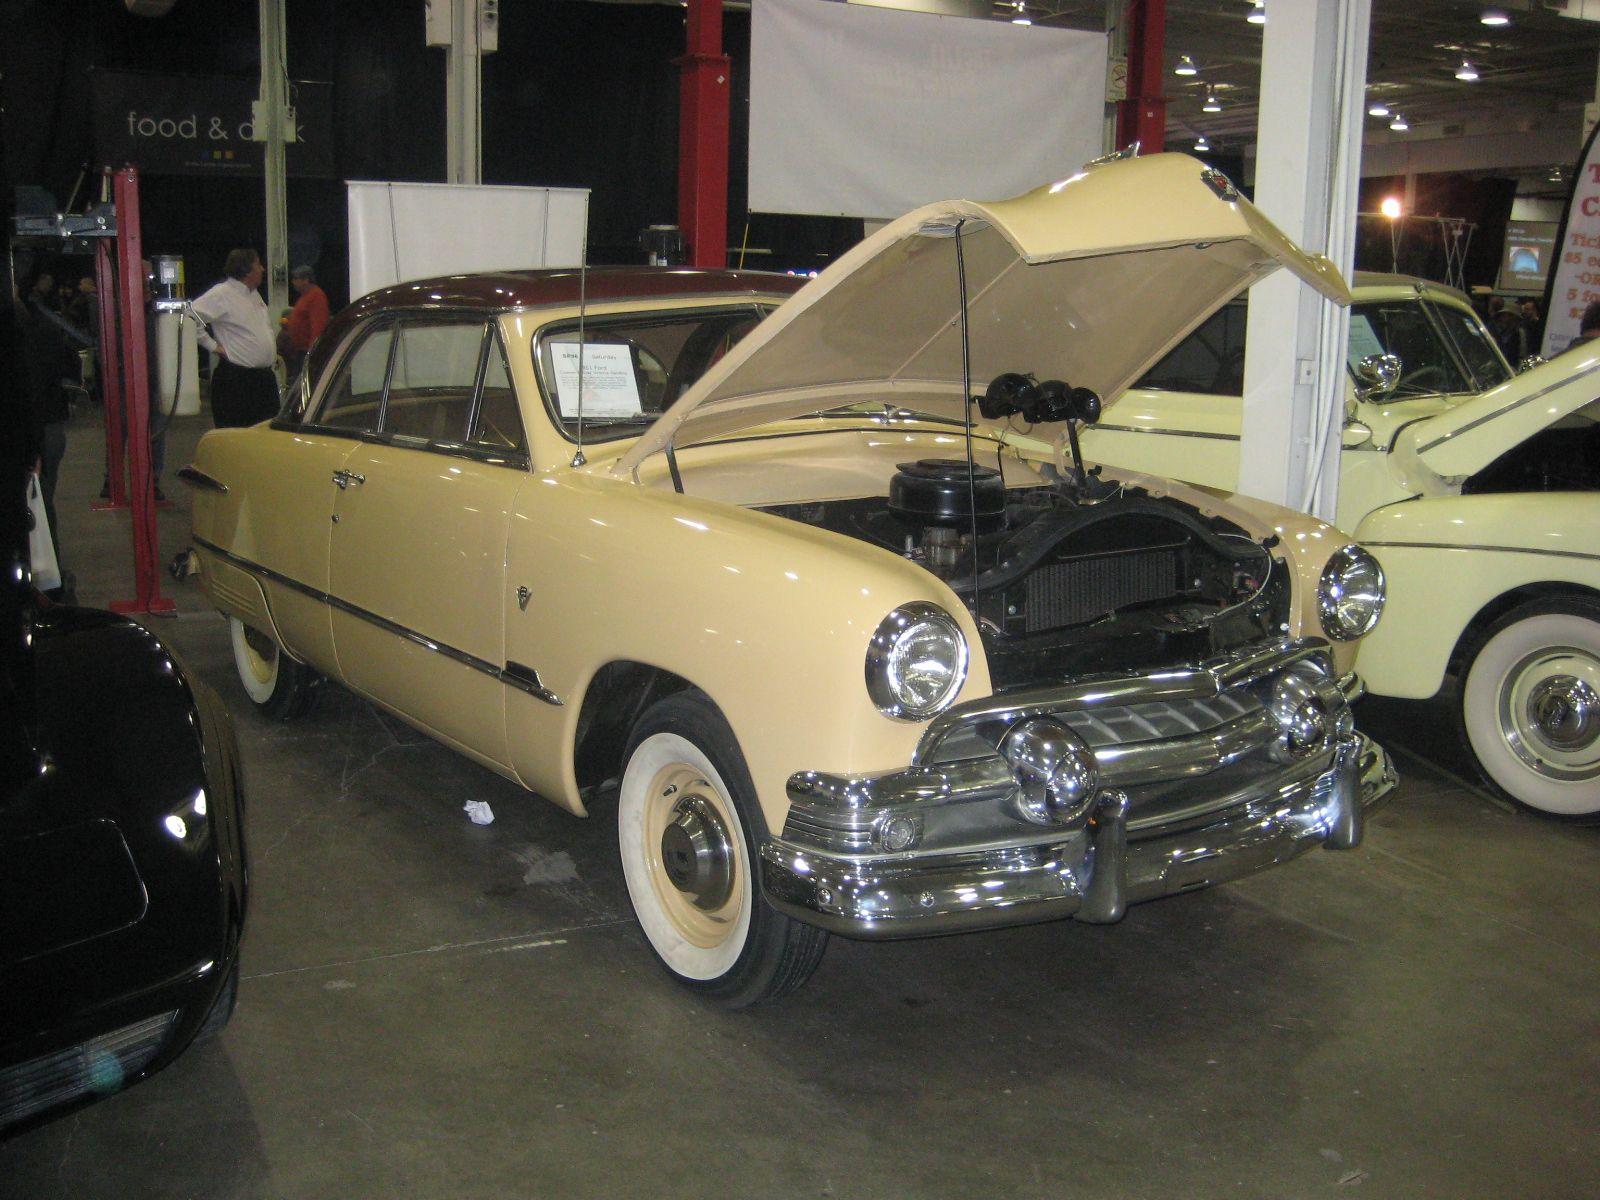 Sold - Toronto Classic Car Auction | Classic Cars | Pinterest ...